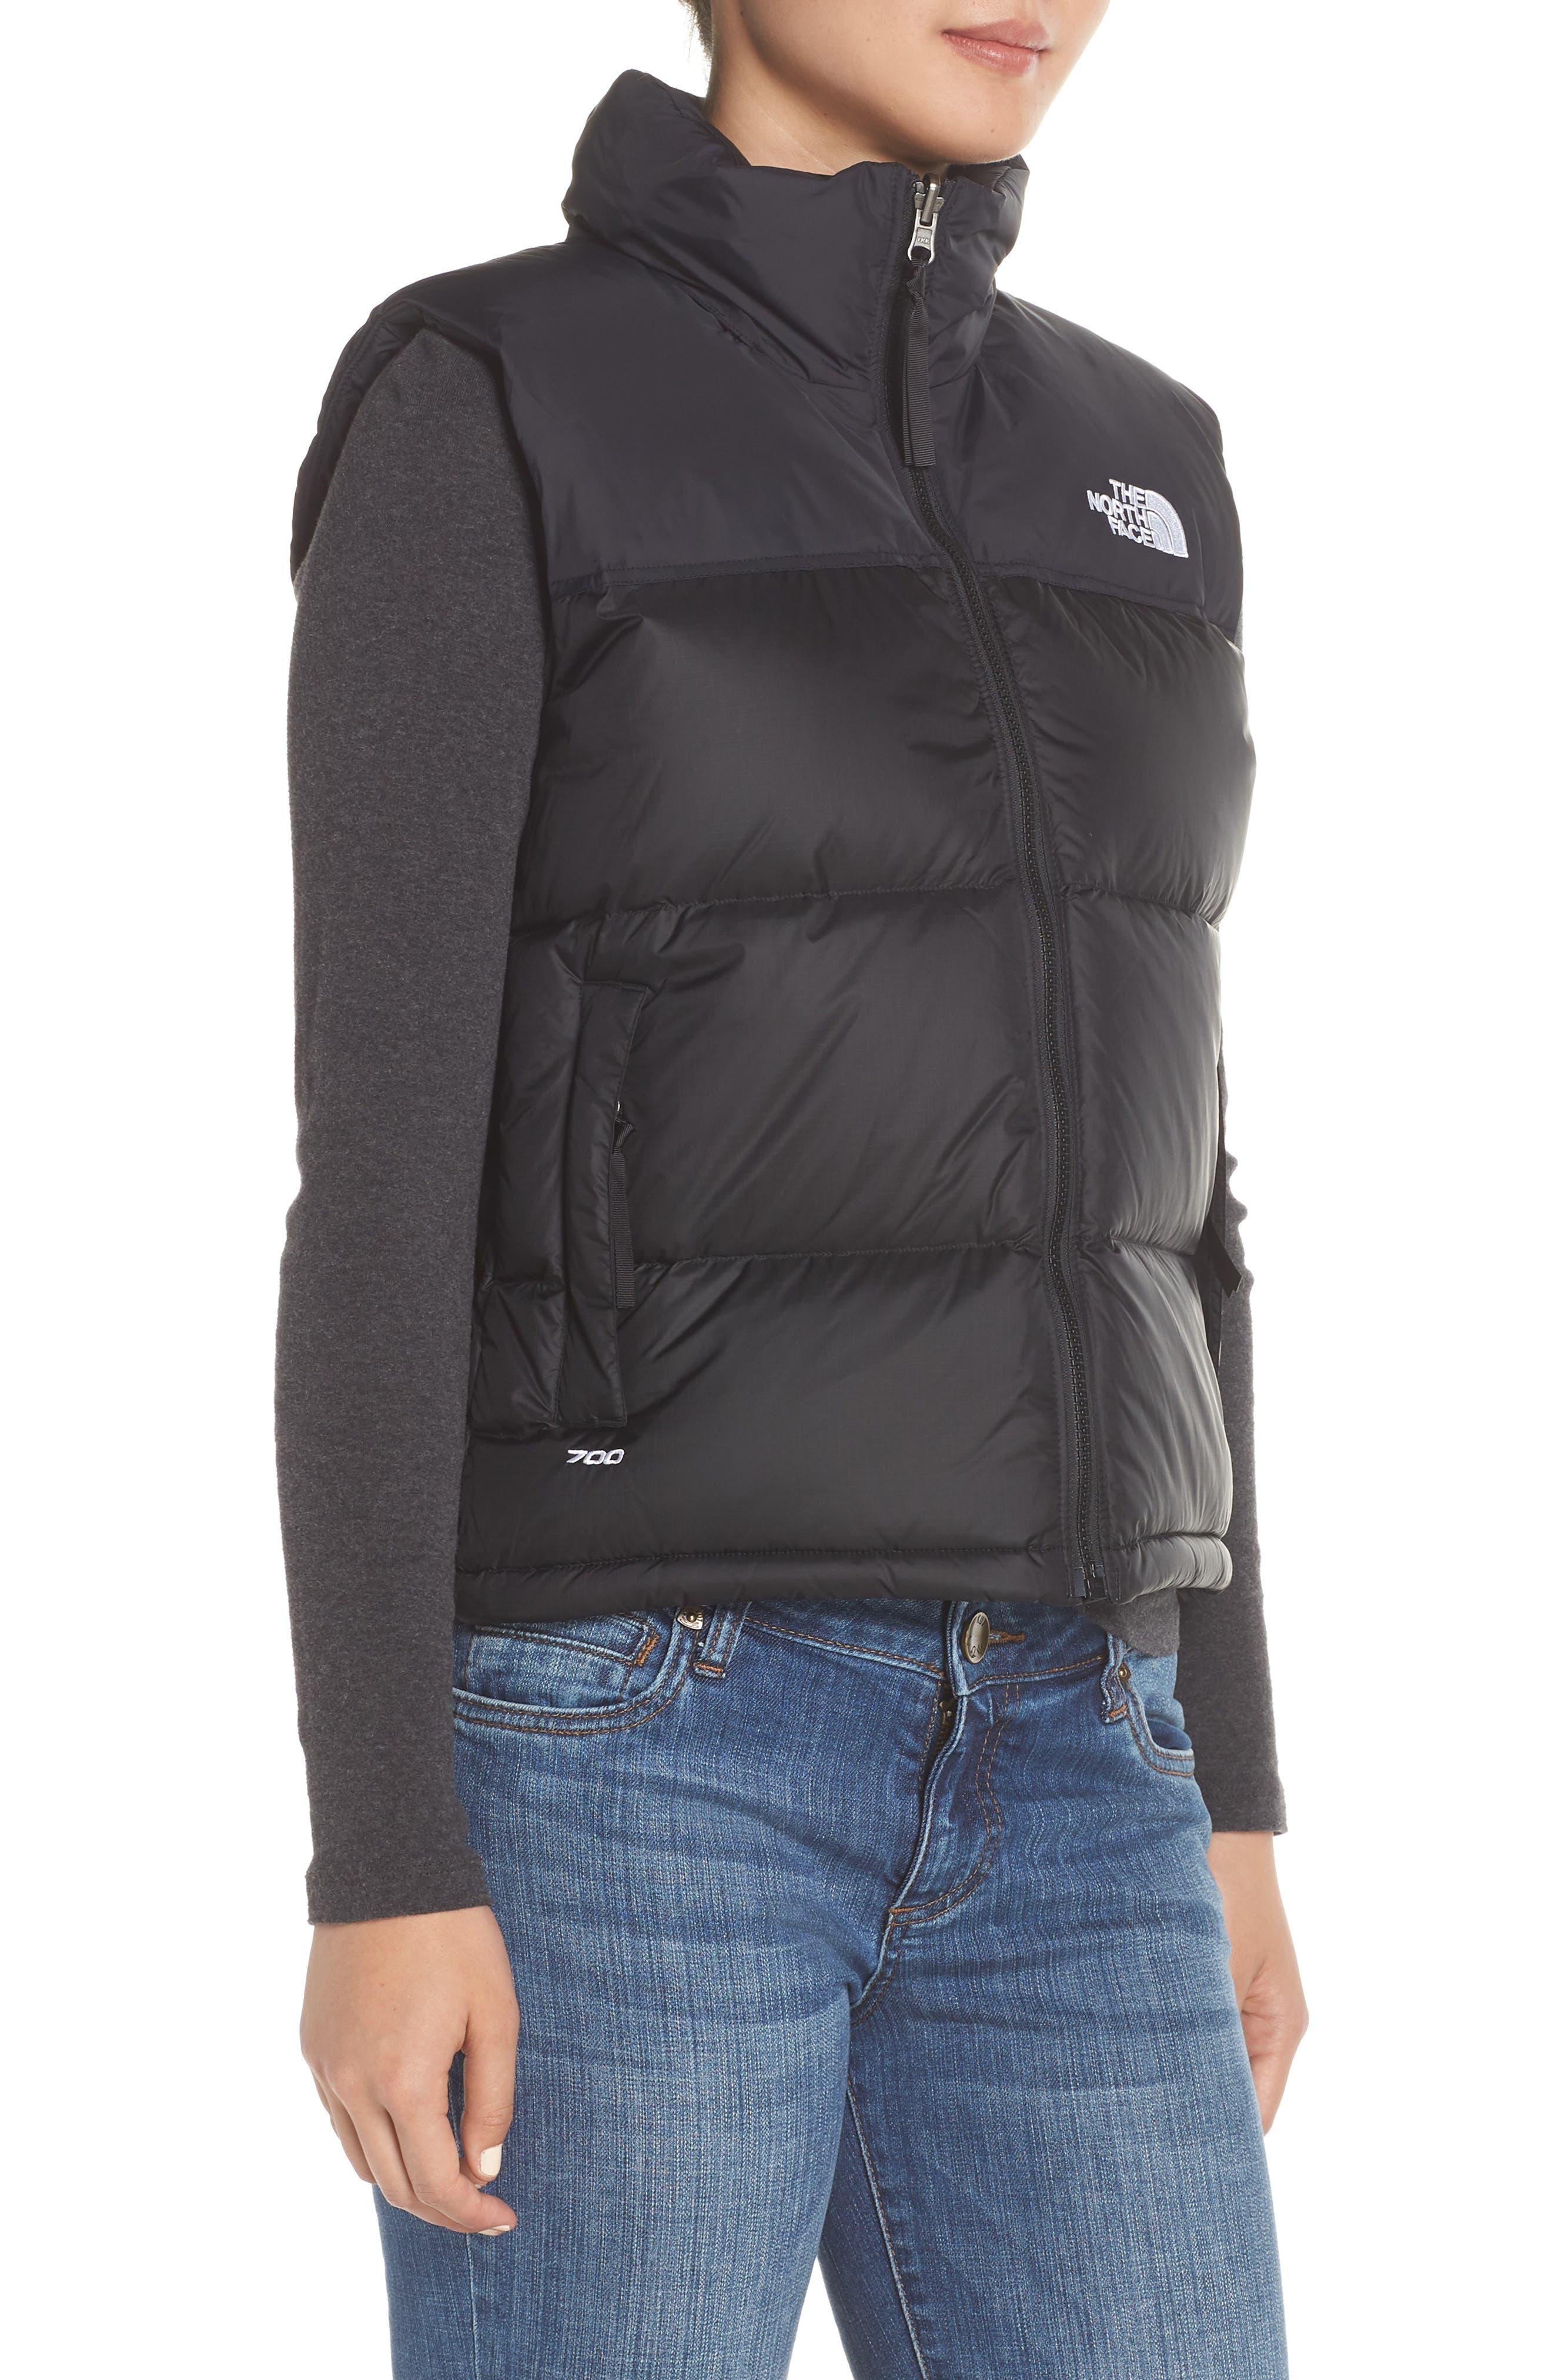 Nuptse 1996 Packable 700-Fill Power Down Vest,                             Alternate thumbnail 3, color,                             TNF BLACK